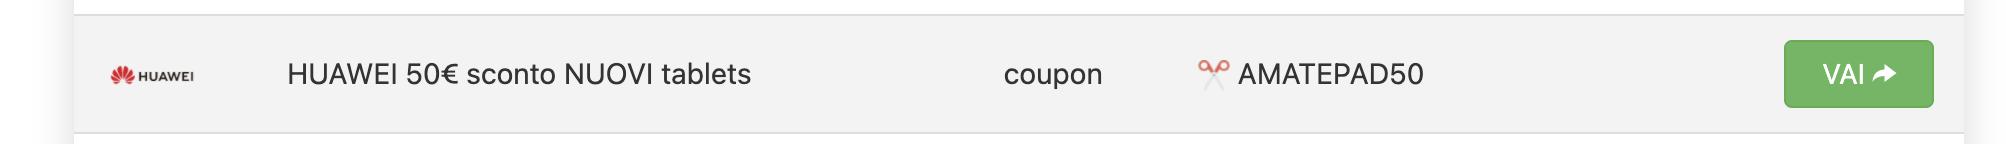 coupon huawei